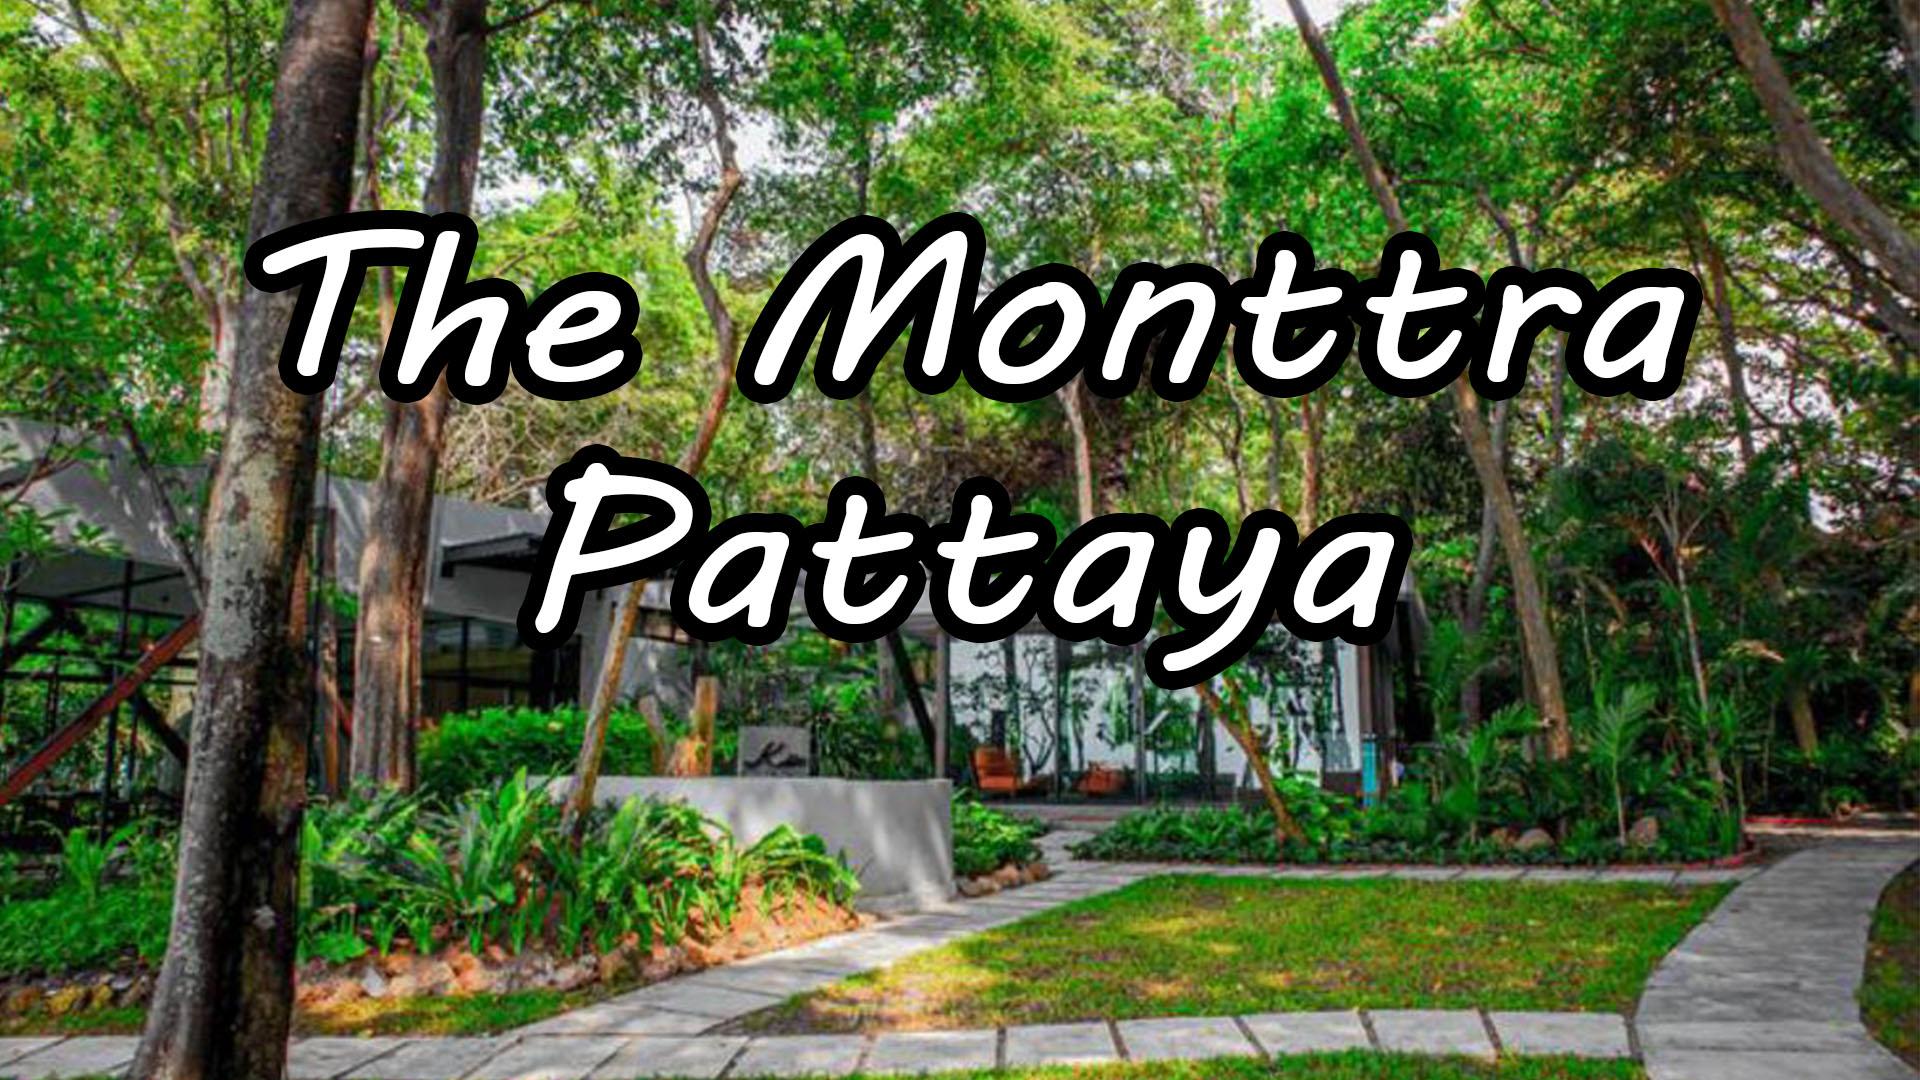 The Monttra Pattaya โรงแรมสวย คุณภาพดี ราคาถูก